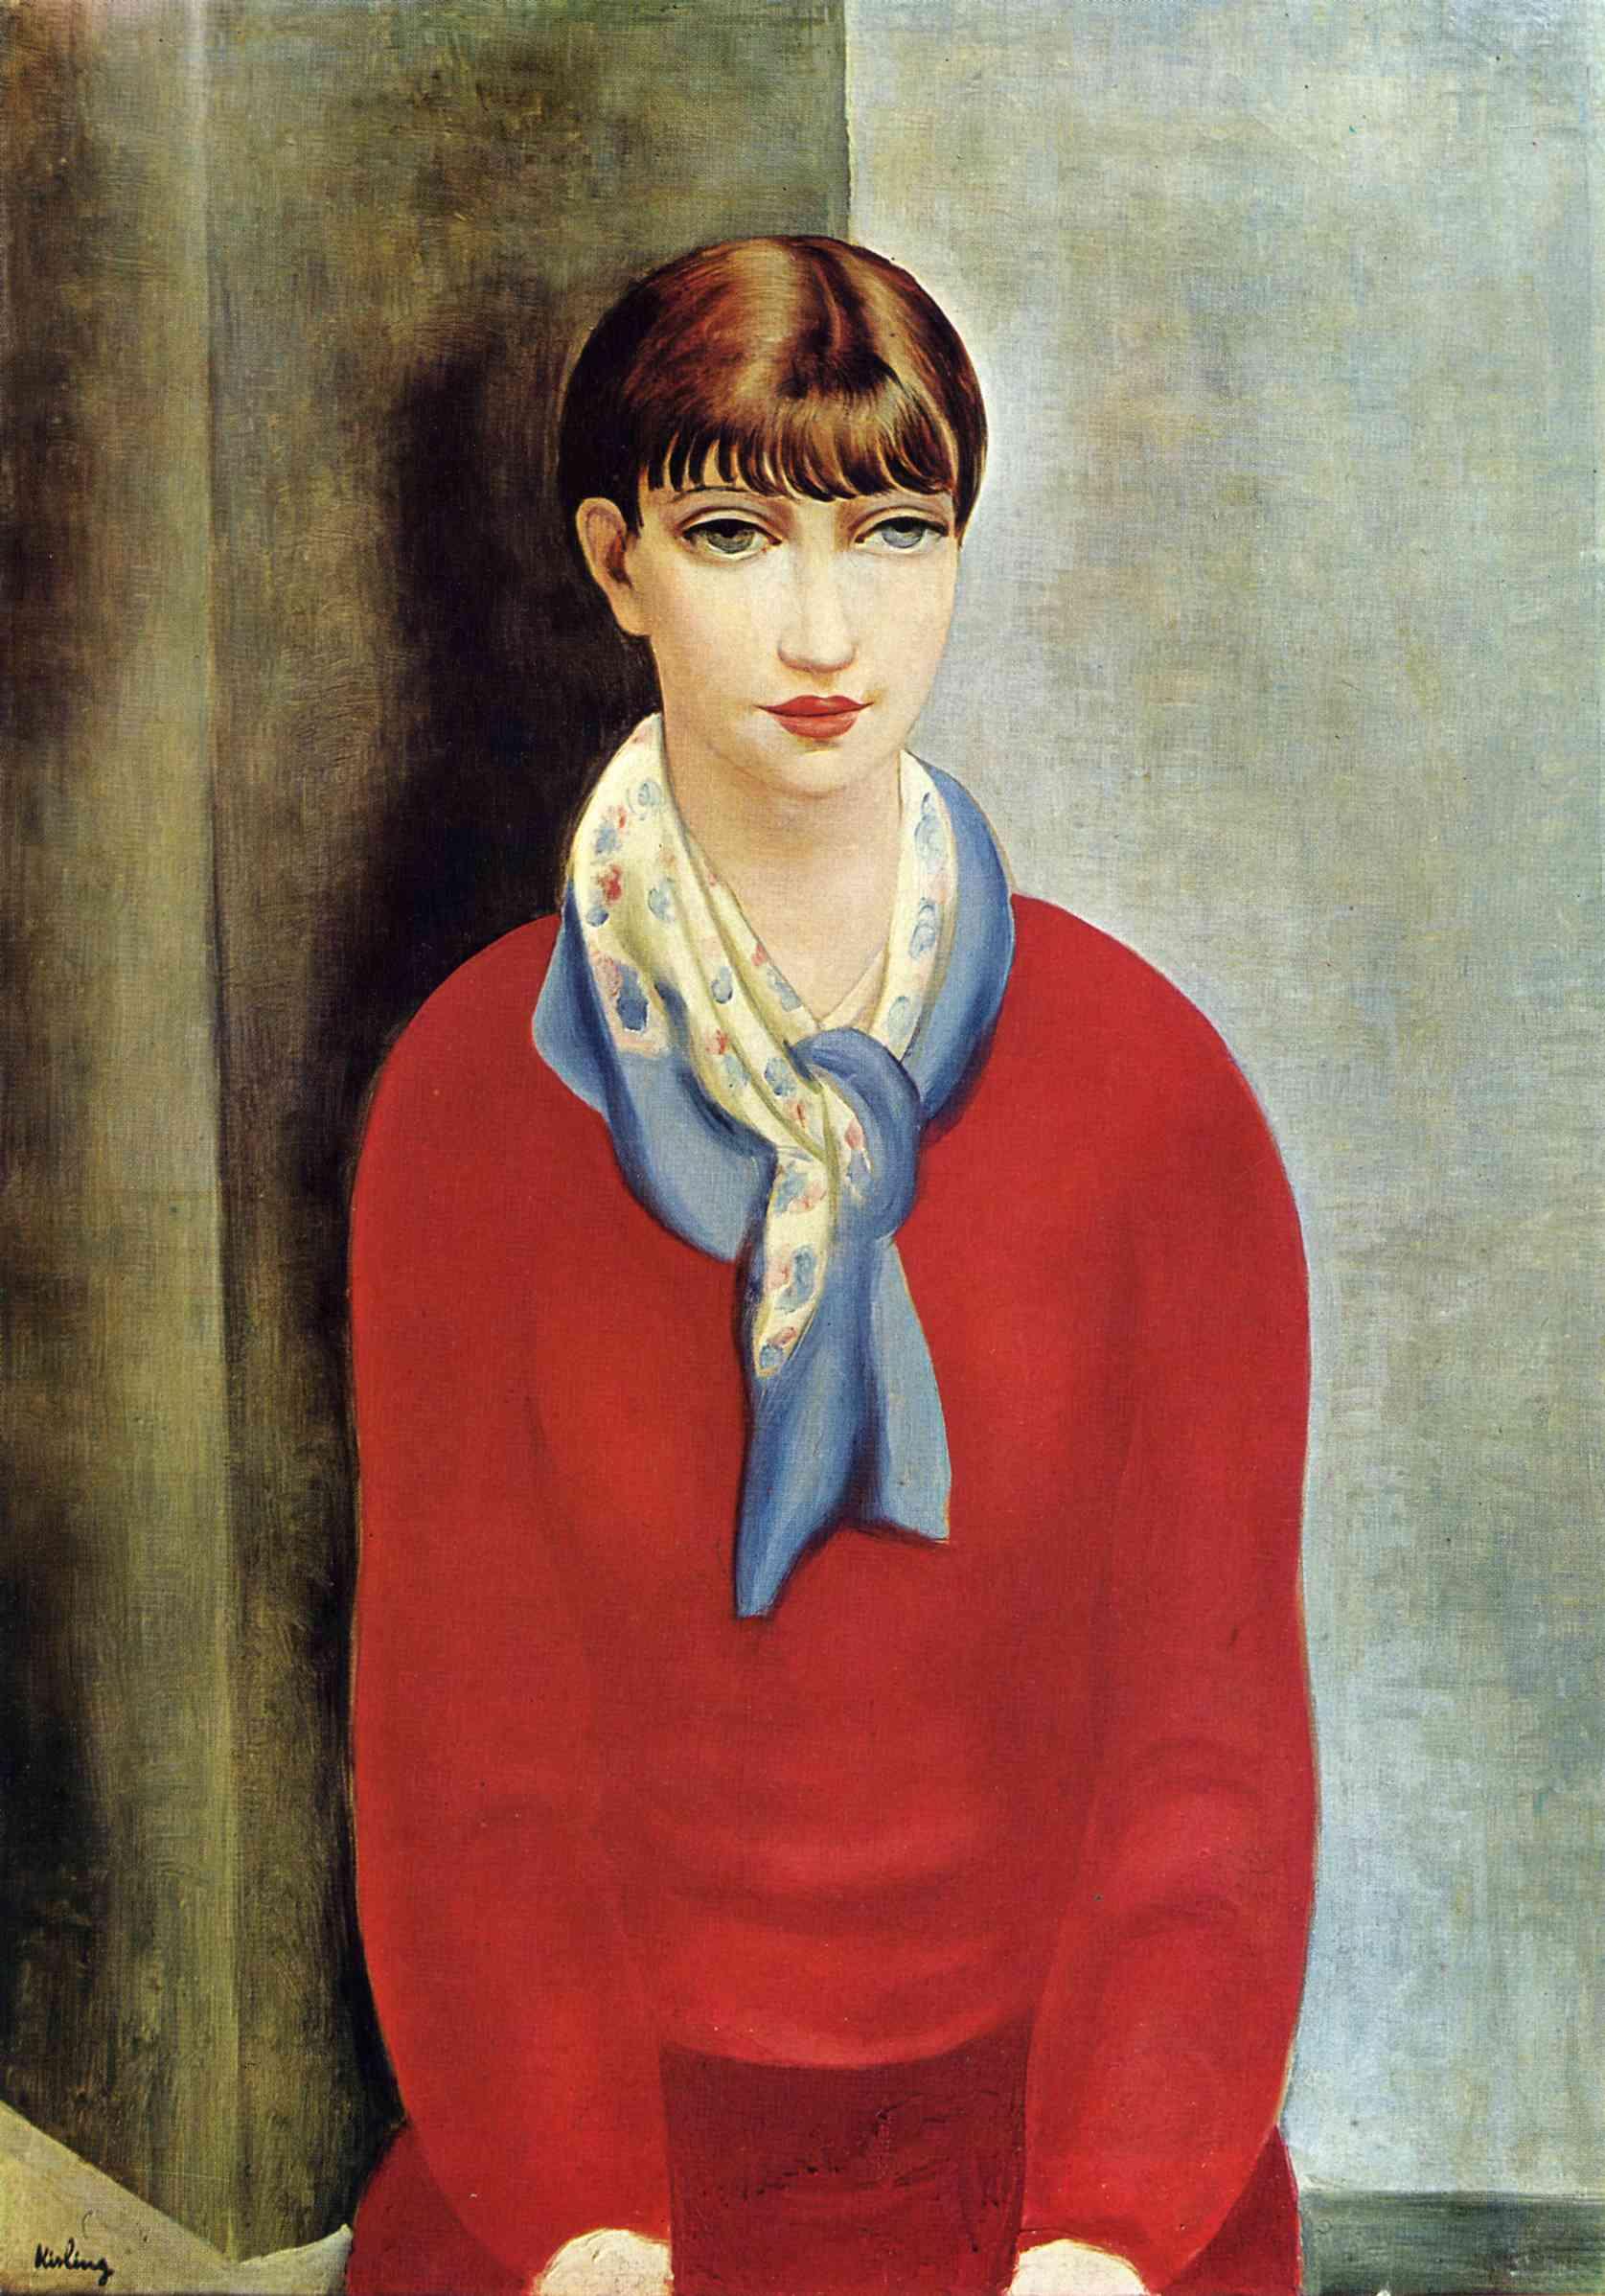 kiki-de-montparnasse-in-a-red-jumper-and-a-blue-scarf-1925_kisling.jpg